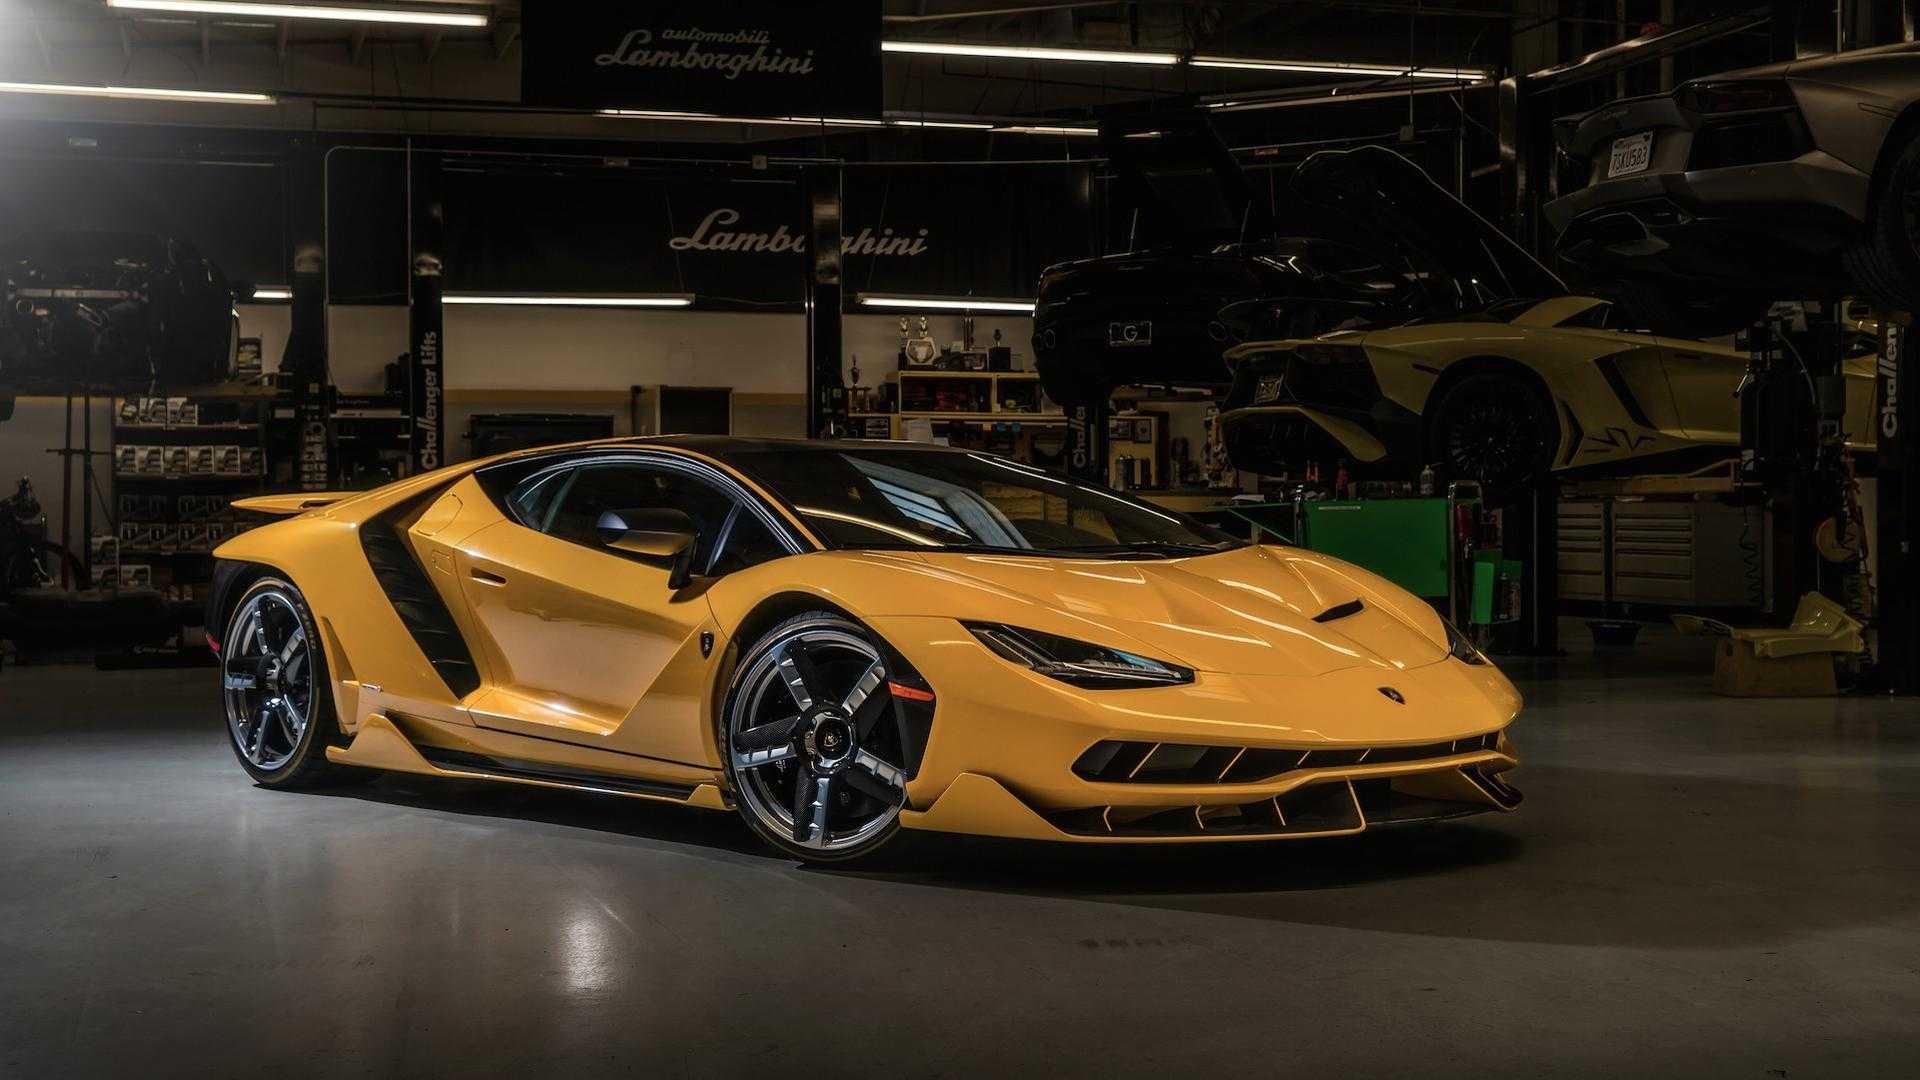 Lamborghini Centenario Yellow Motor1 Com Photos